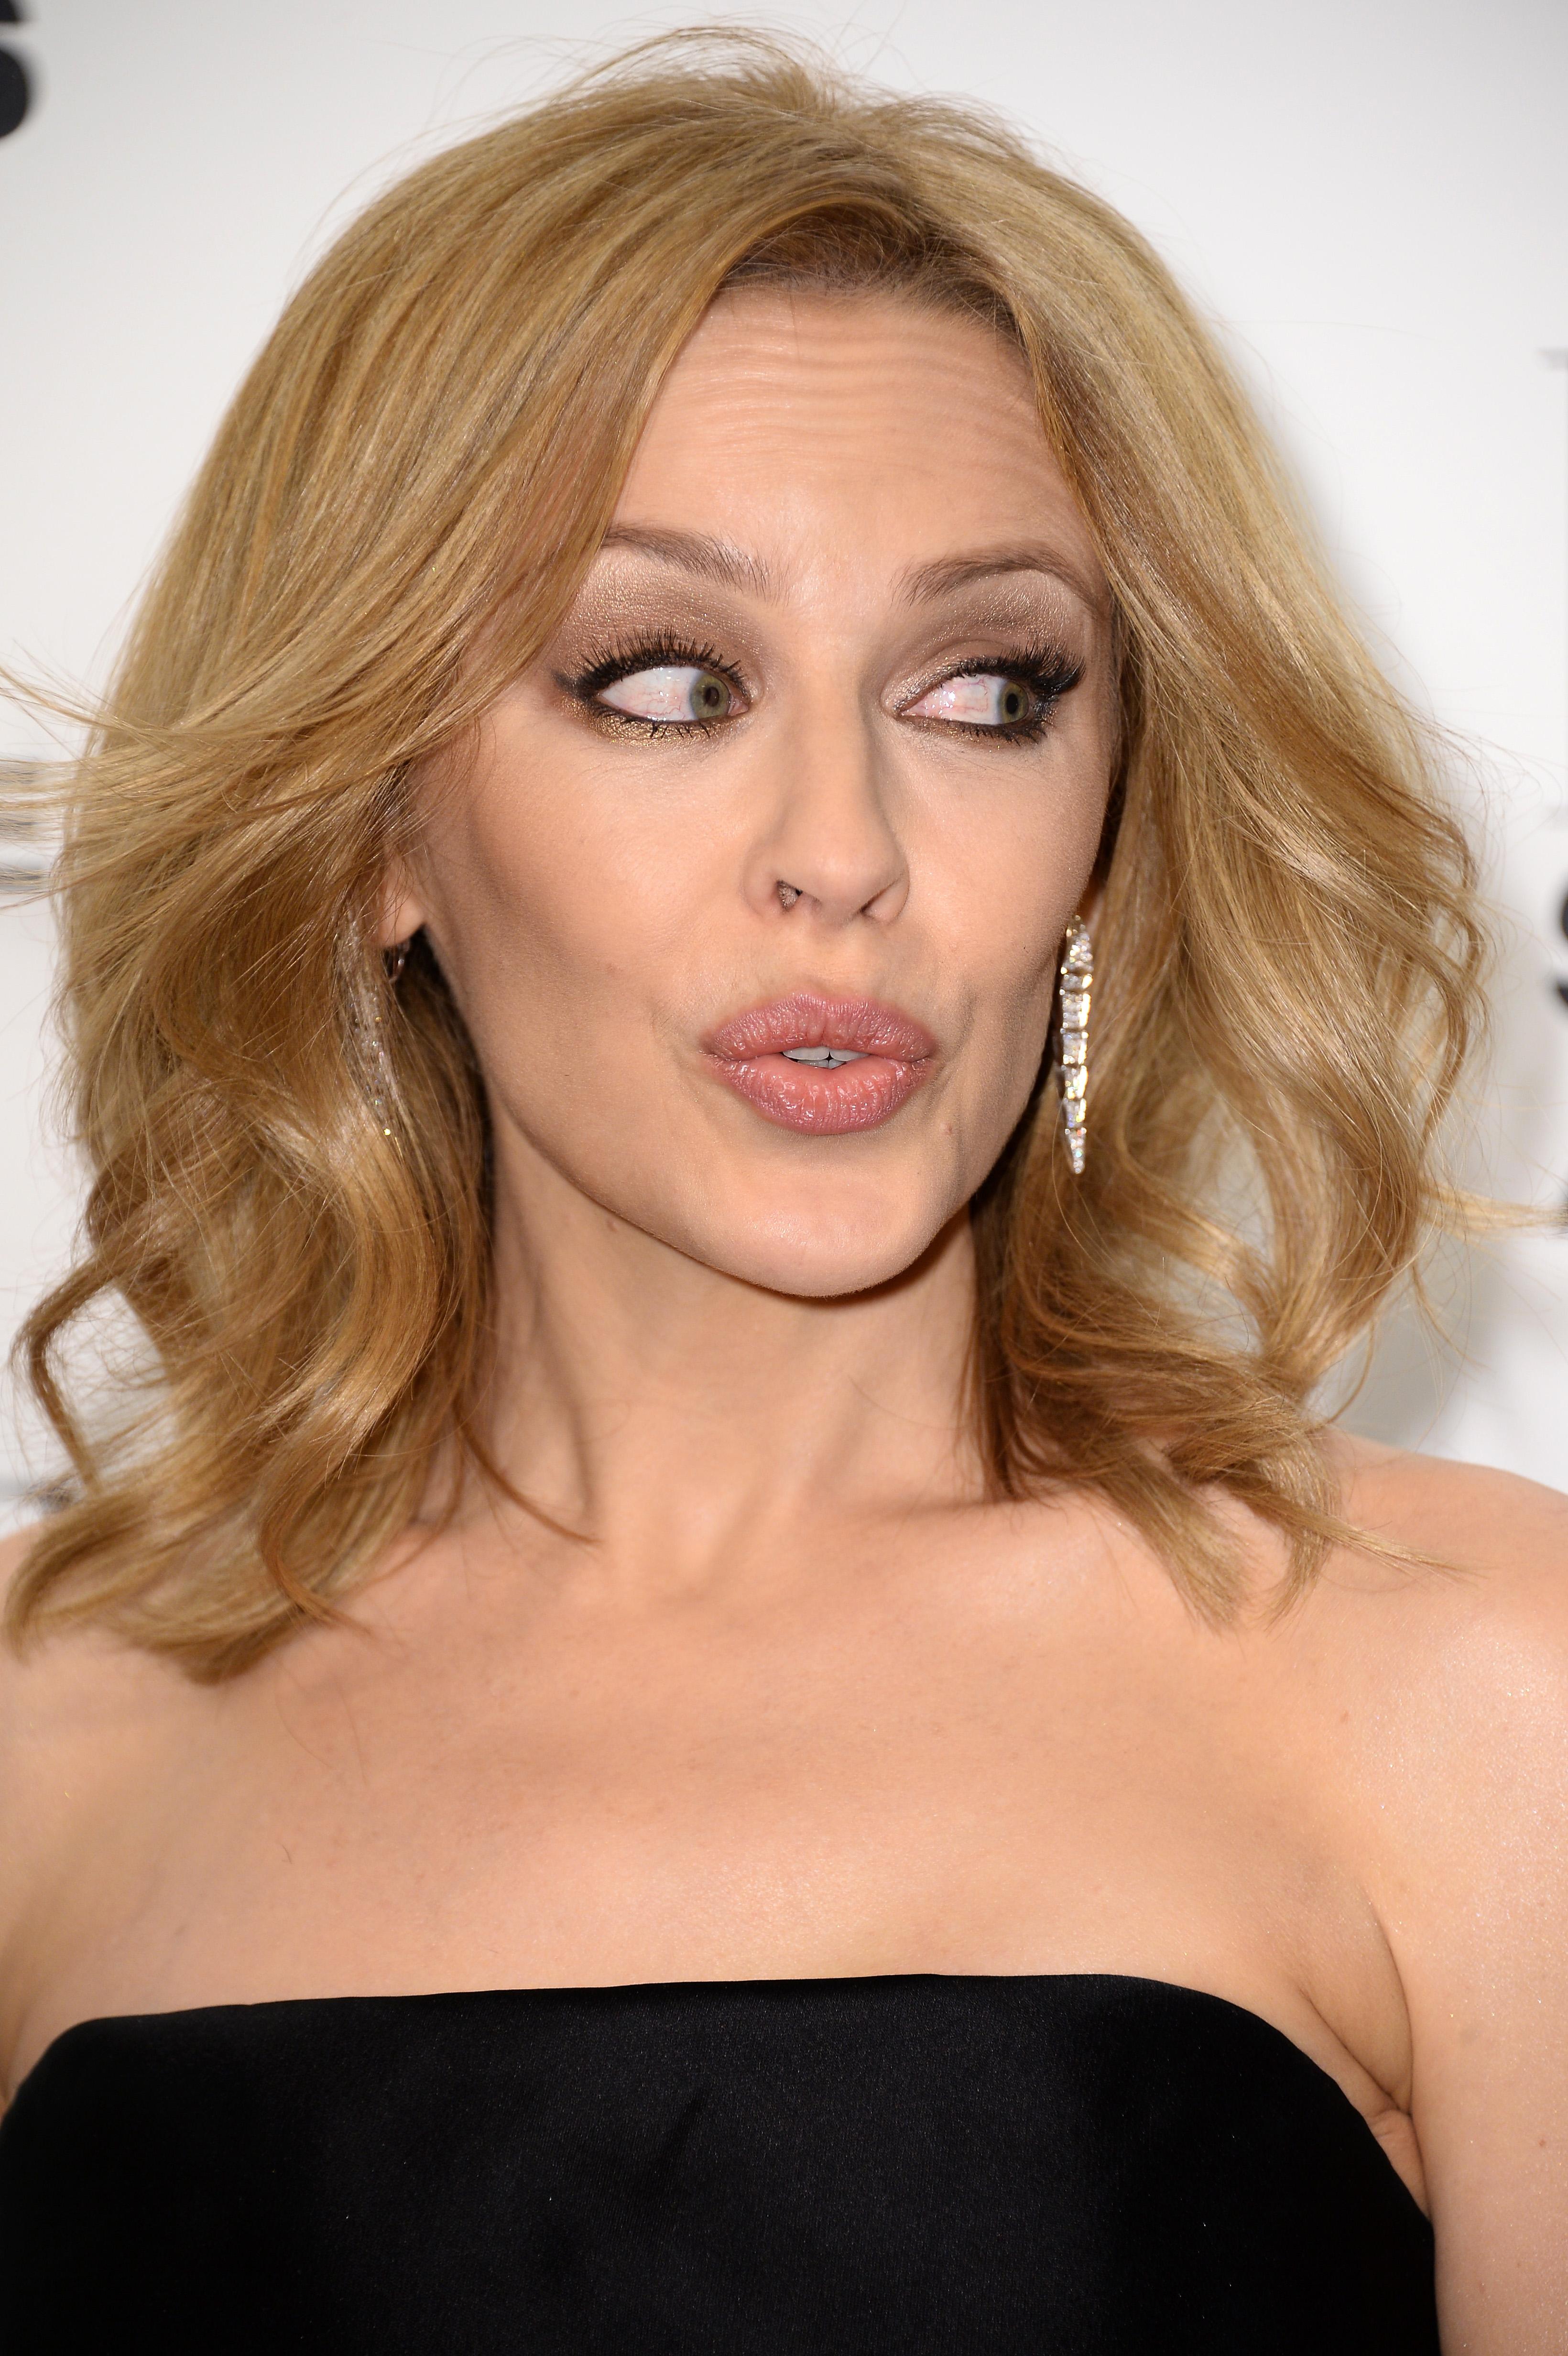 Kylie Minogue's NSFW